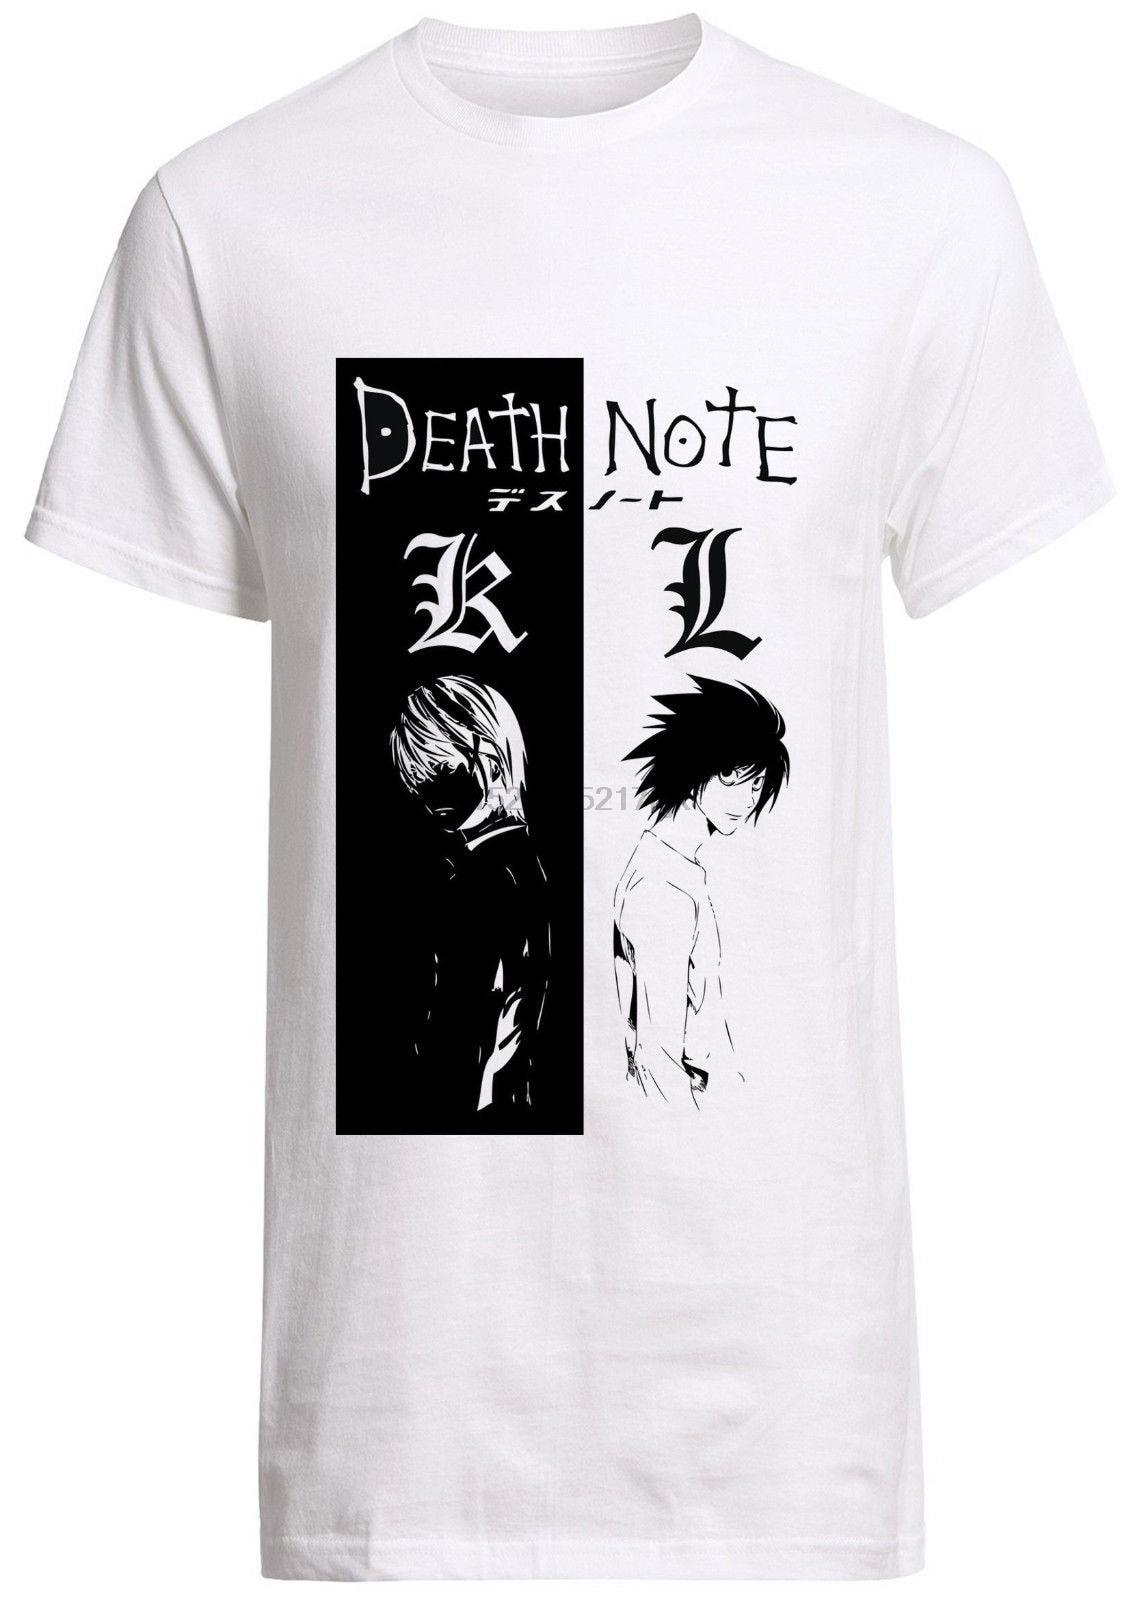 La nota de muerte anime TV fan camisa Manga Ryuk goku naruto personalizado lejía camiseta de akira envío gratis Harajuku t camisa